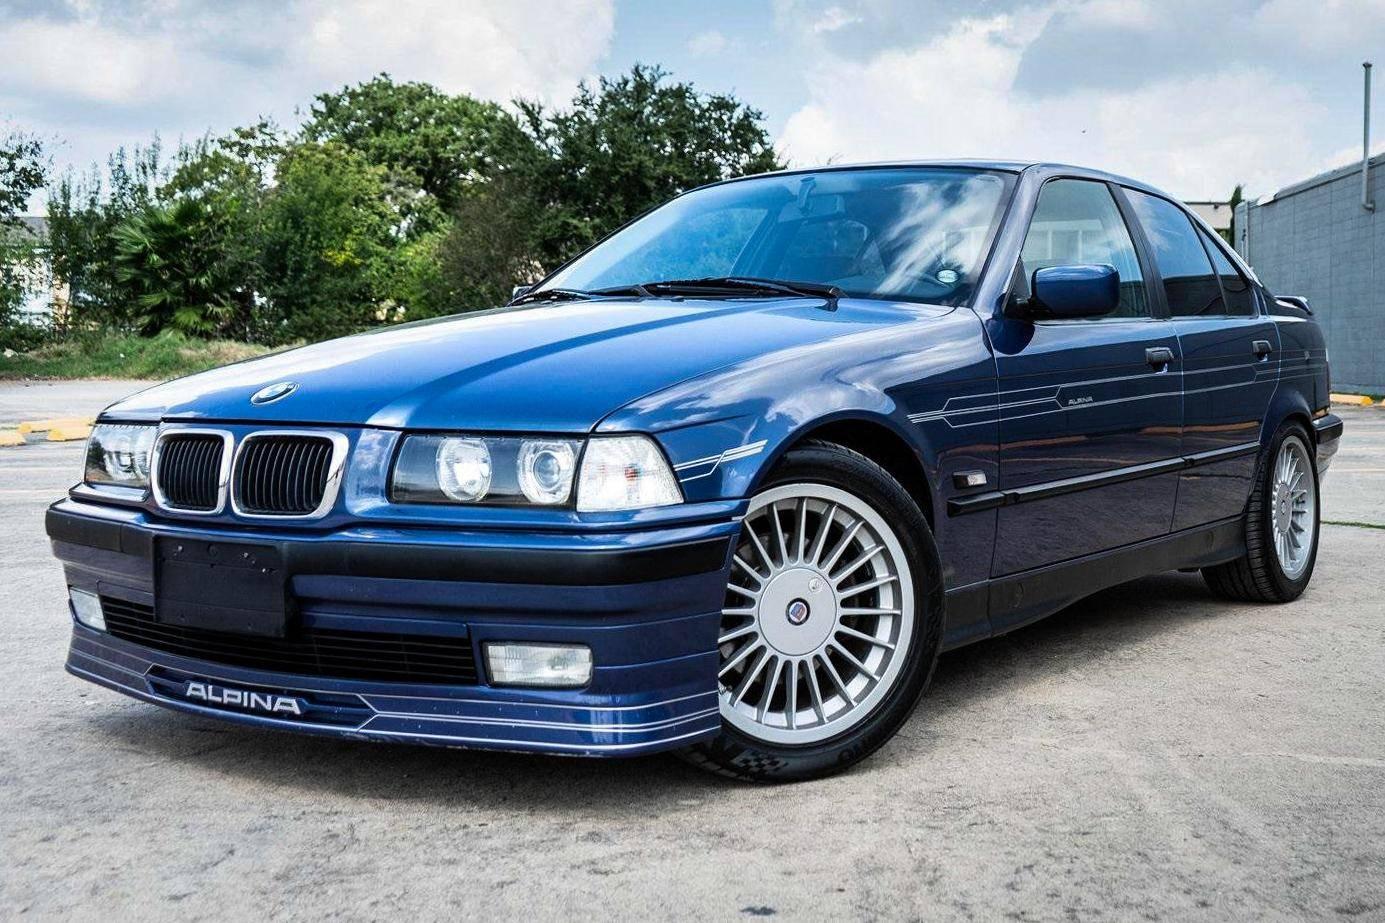 1994 Bmw Alpina B3 3 0 1 Auction Cars Bids